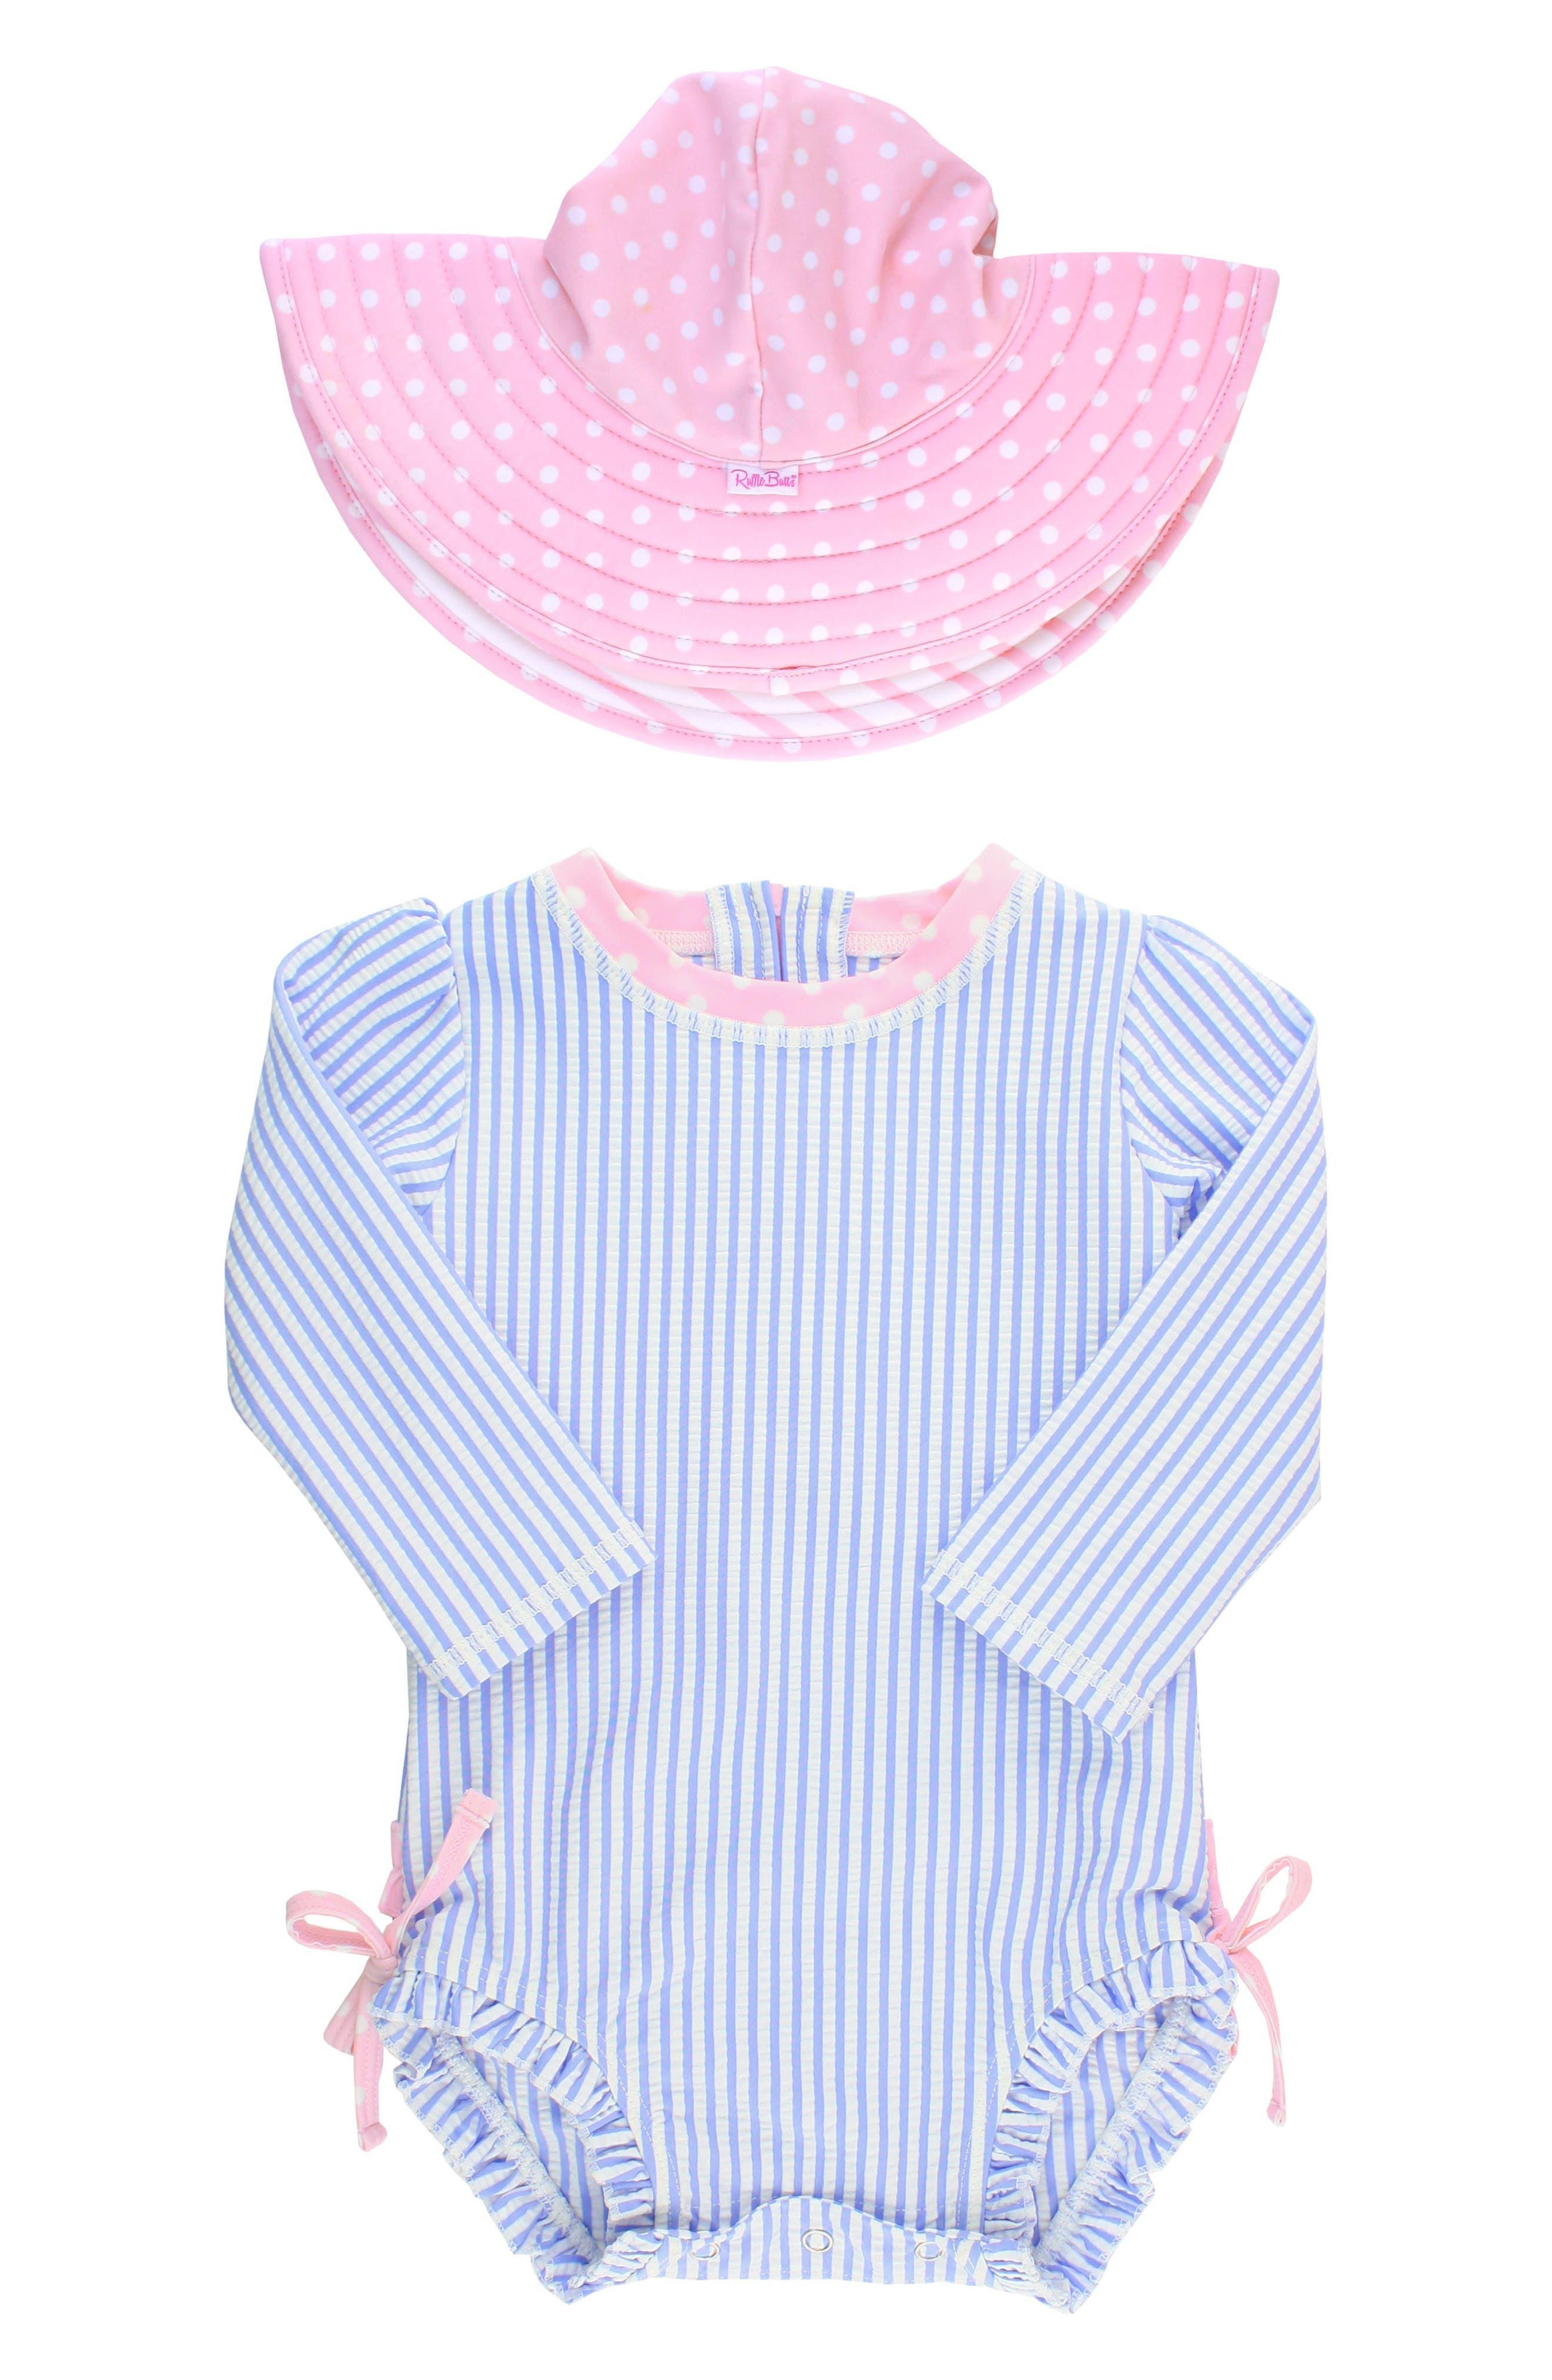 Seersucker One-Piece Rashguard Swimsuit & Hat Set,                         Main,                         color, BLUE